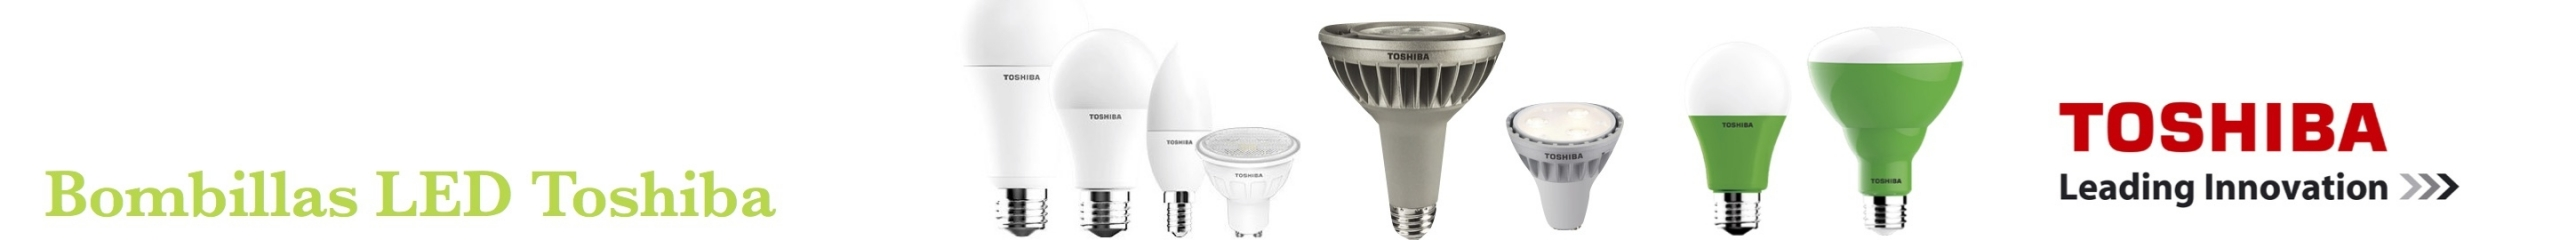 Bombillas y Tubos LED Toshiba